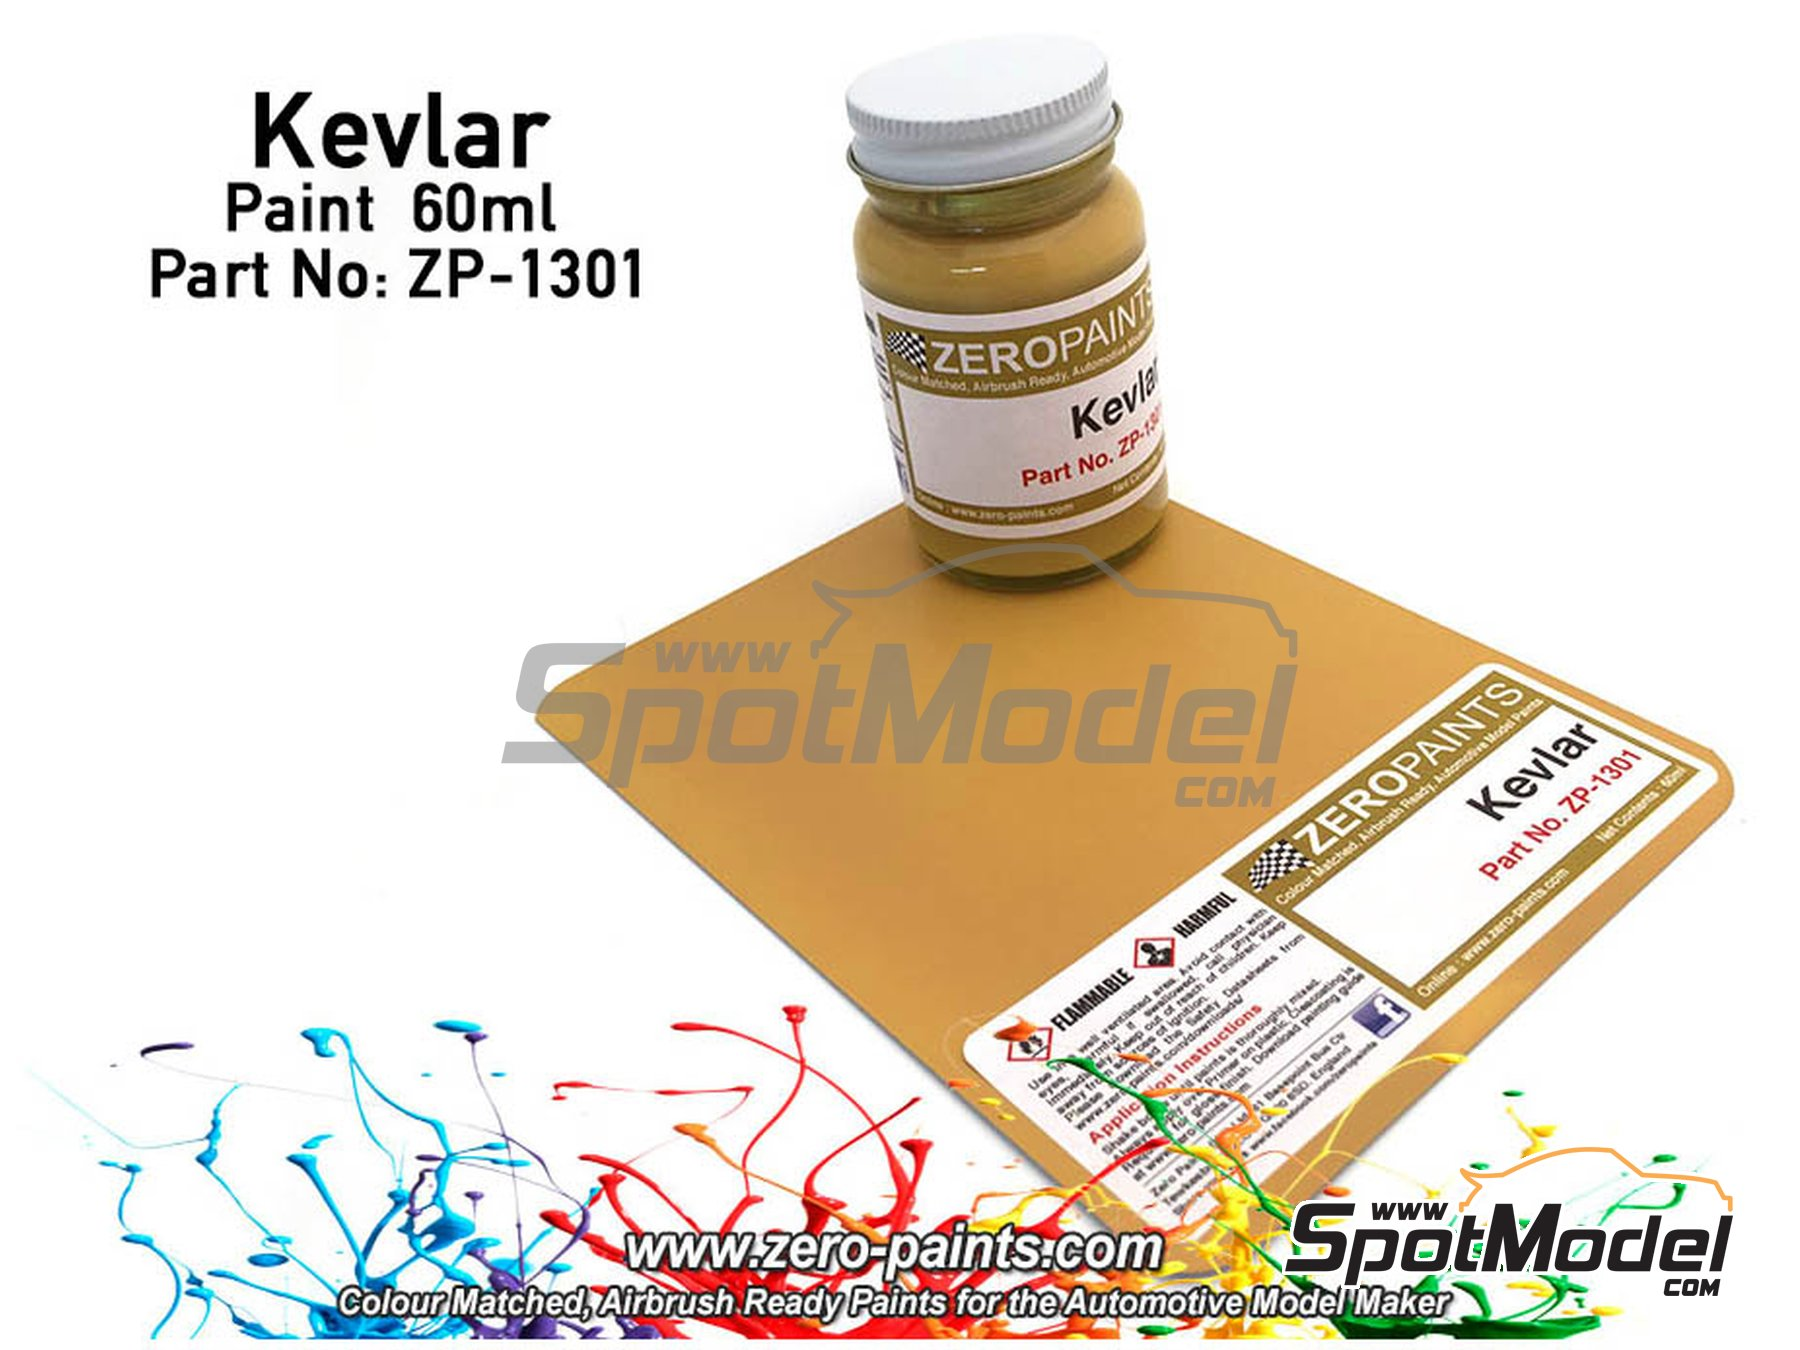 Image 1: Kevlar - 1 x 60ml | Paint manufactured by Zero Paints (ref.ZP-1301)